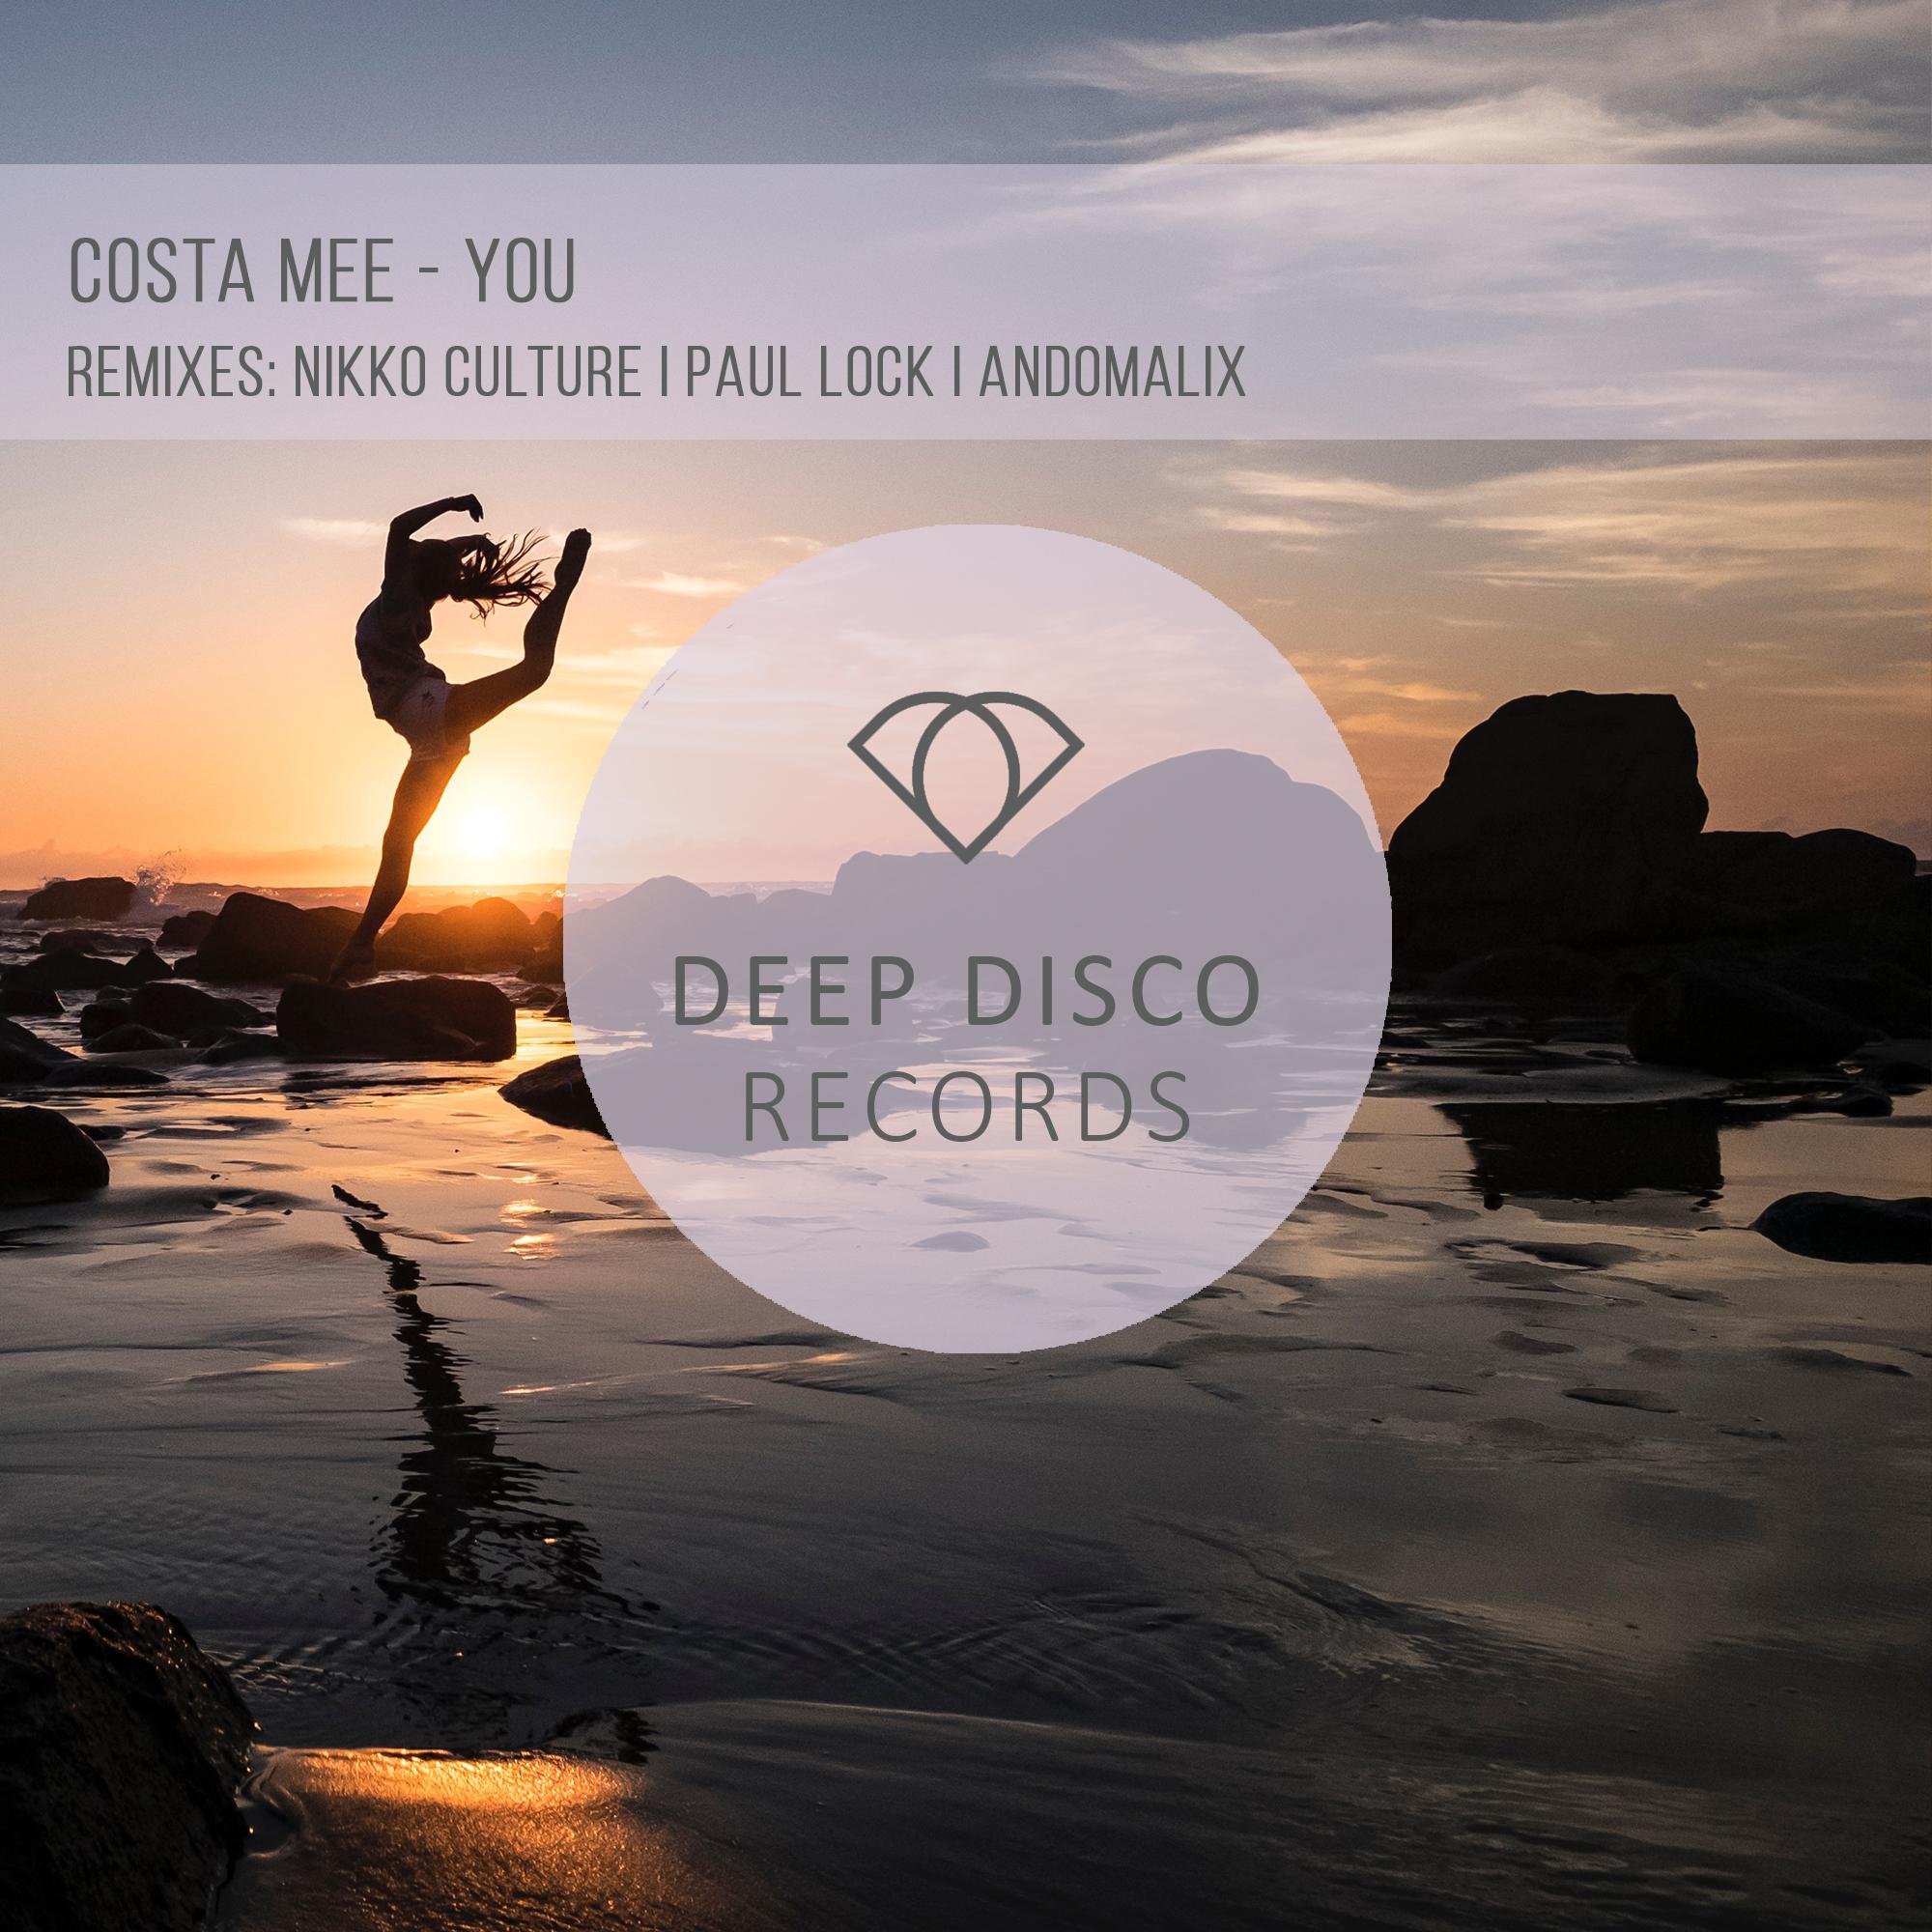 Costa Mee - You